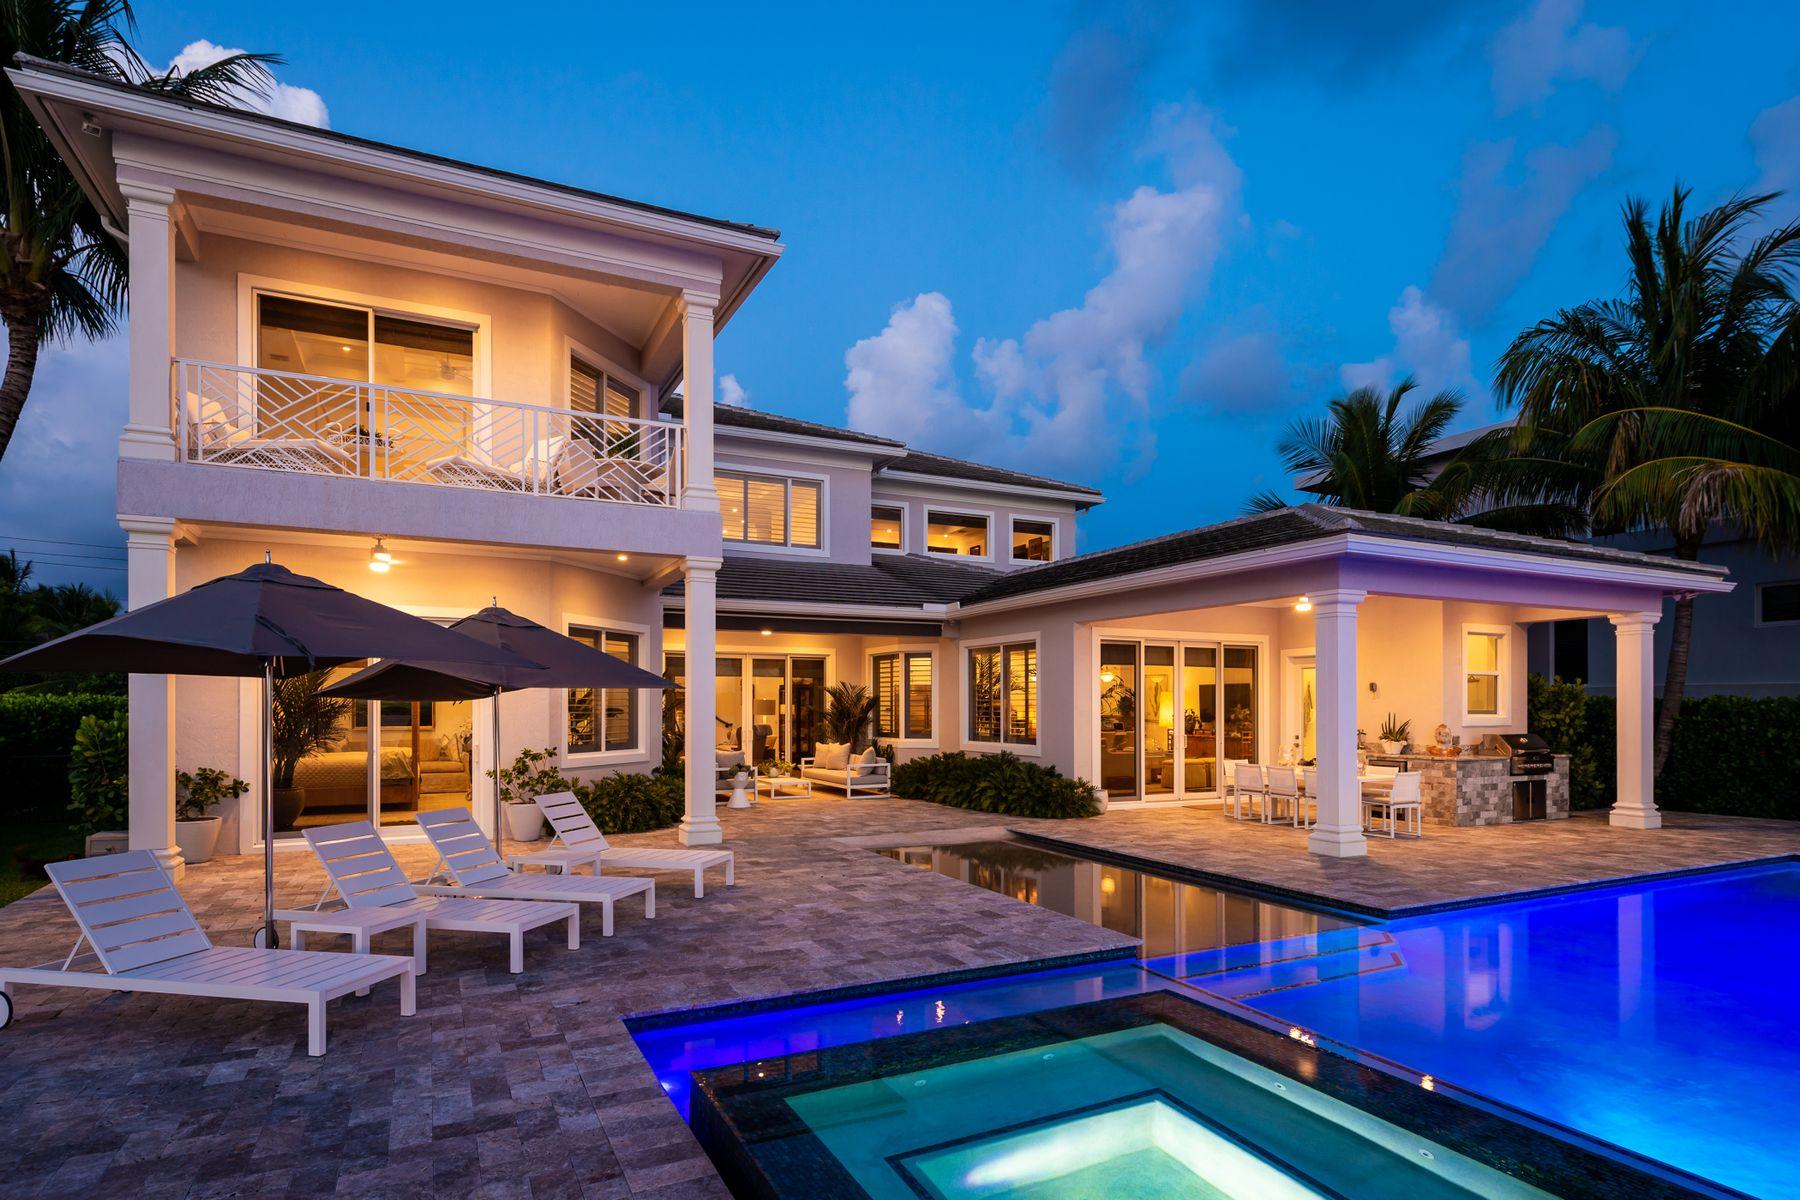 Single Family Homes for Sale at 317 S Atlantic Drive Lantana, Florida 33462 United States